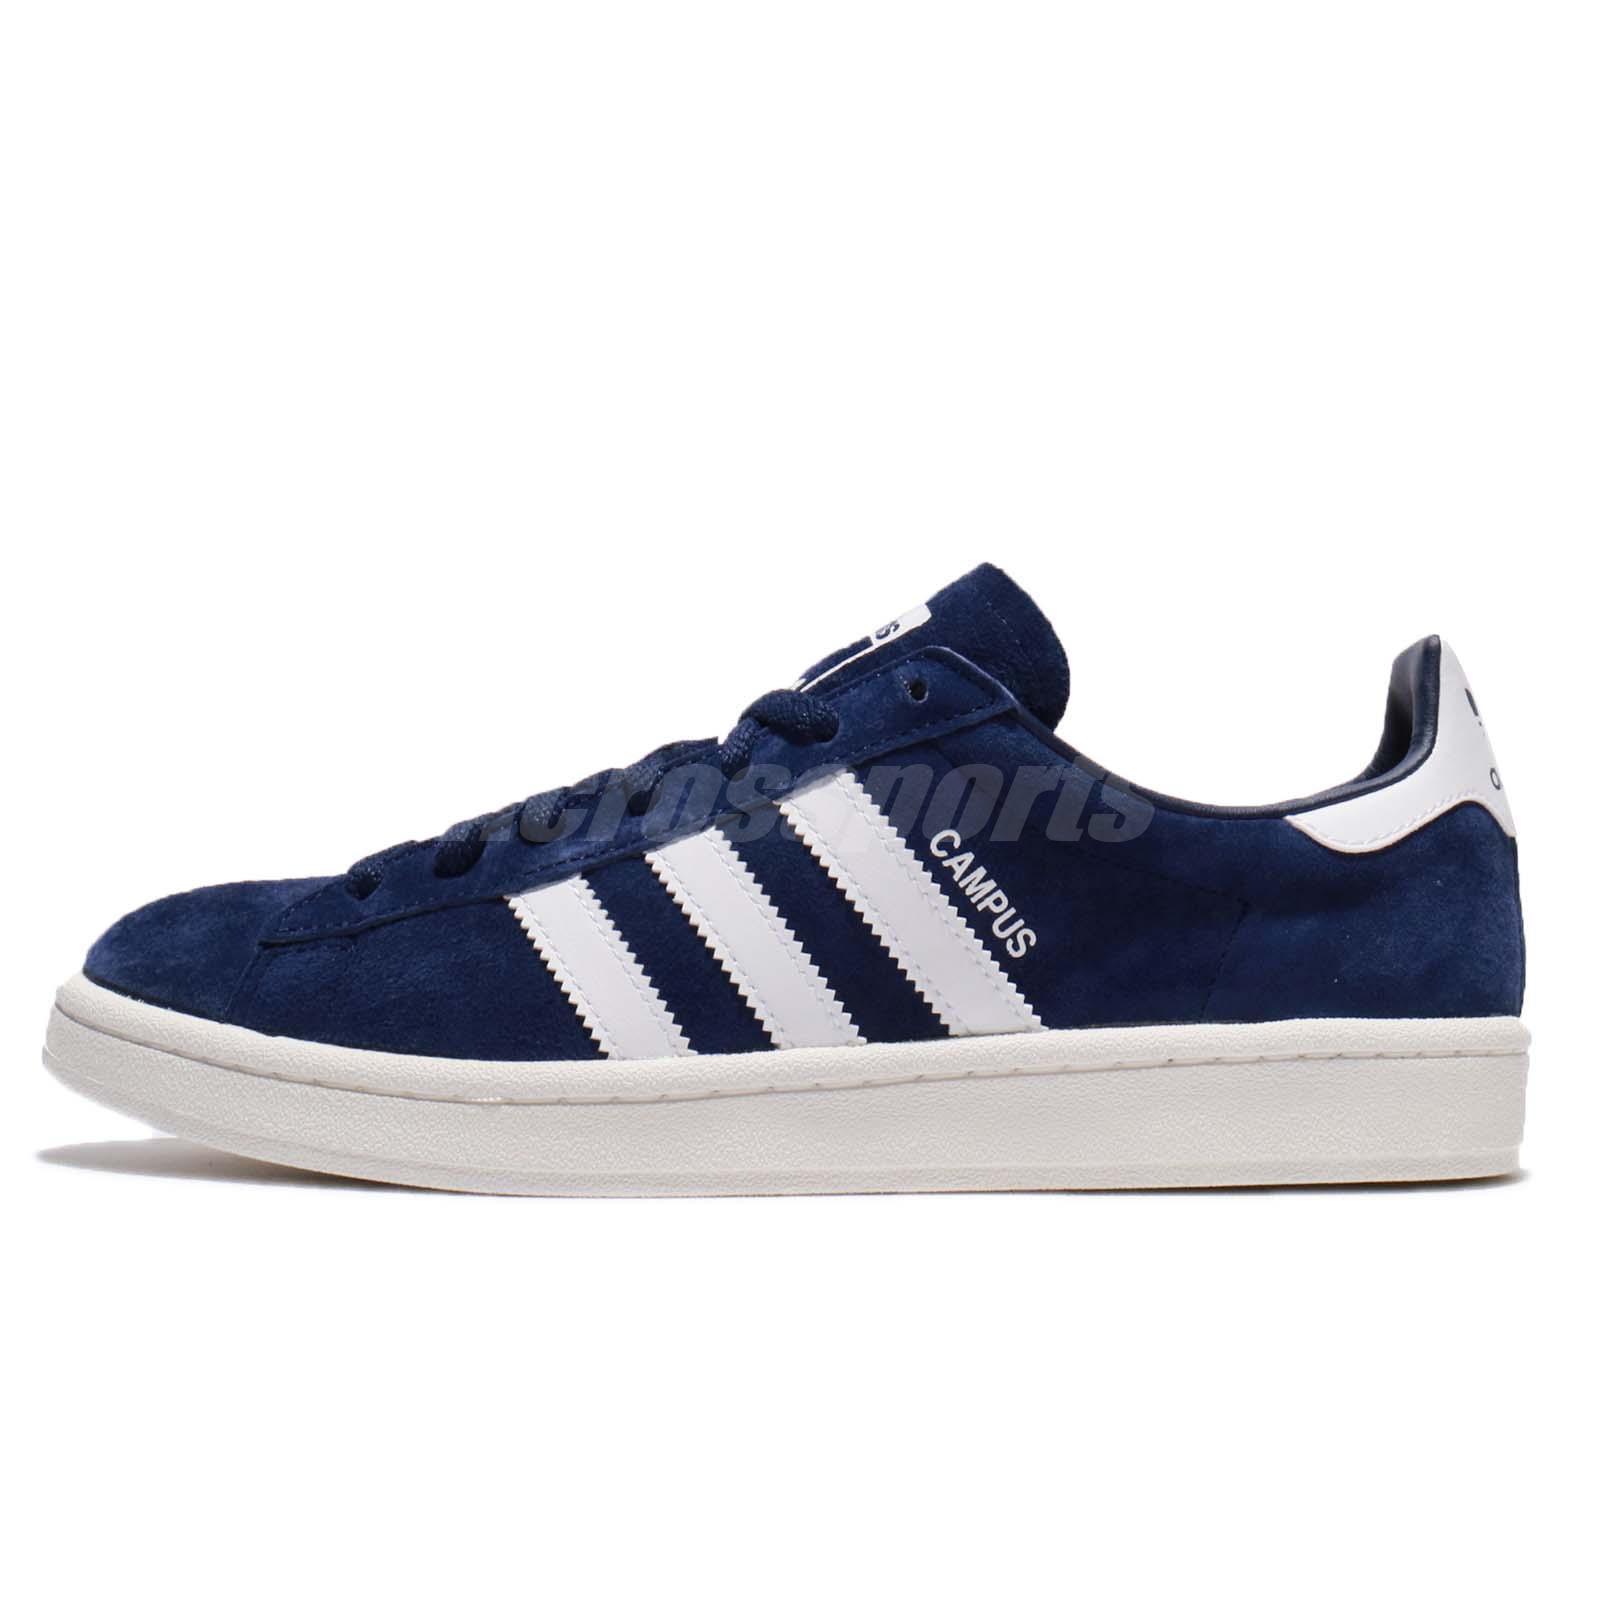 sports shoes ce958 20ac9 adidas Originals Campus Suede Dark Blue White Navy Men Classic Shoes BZ0086